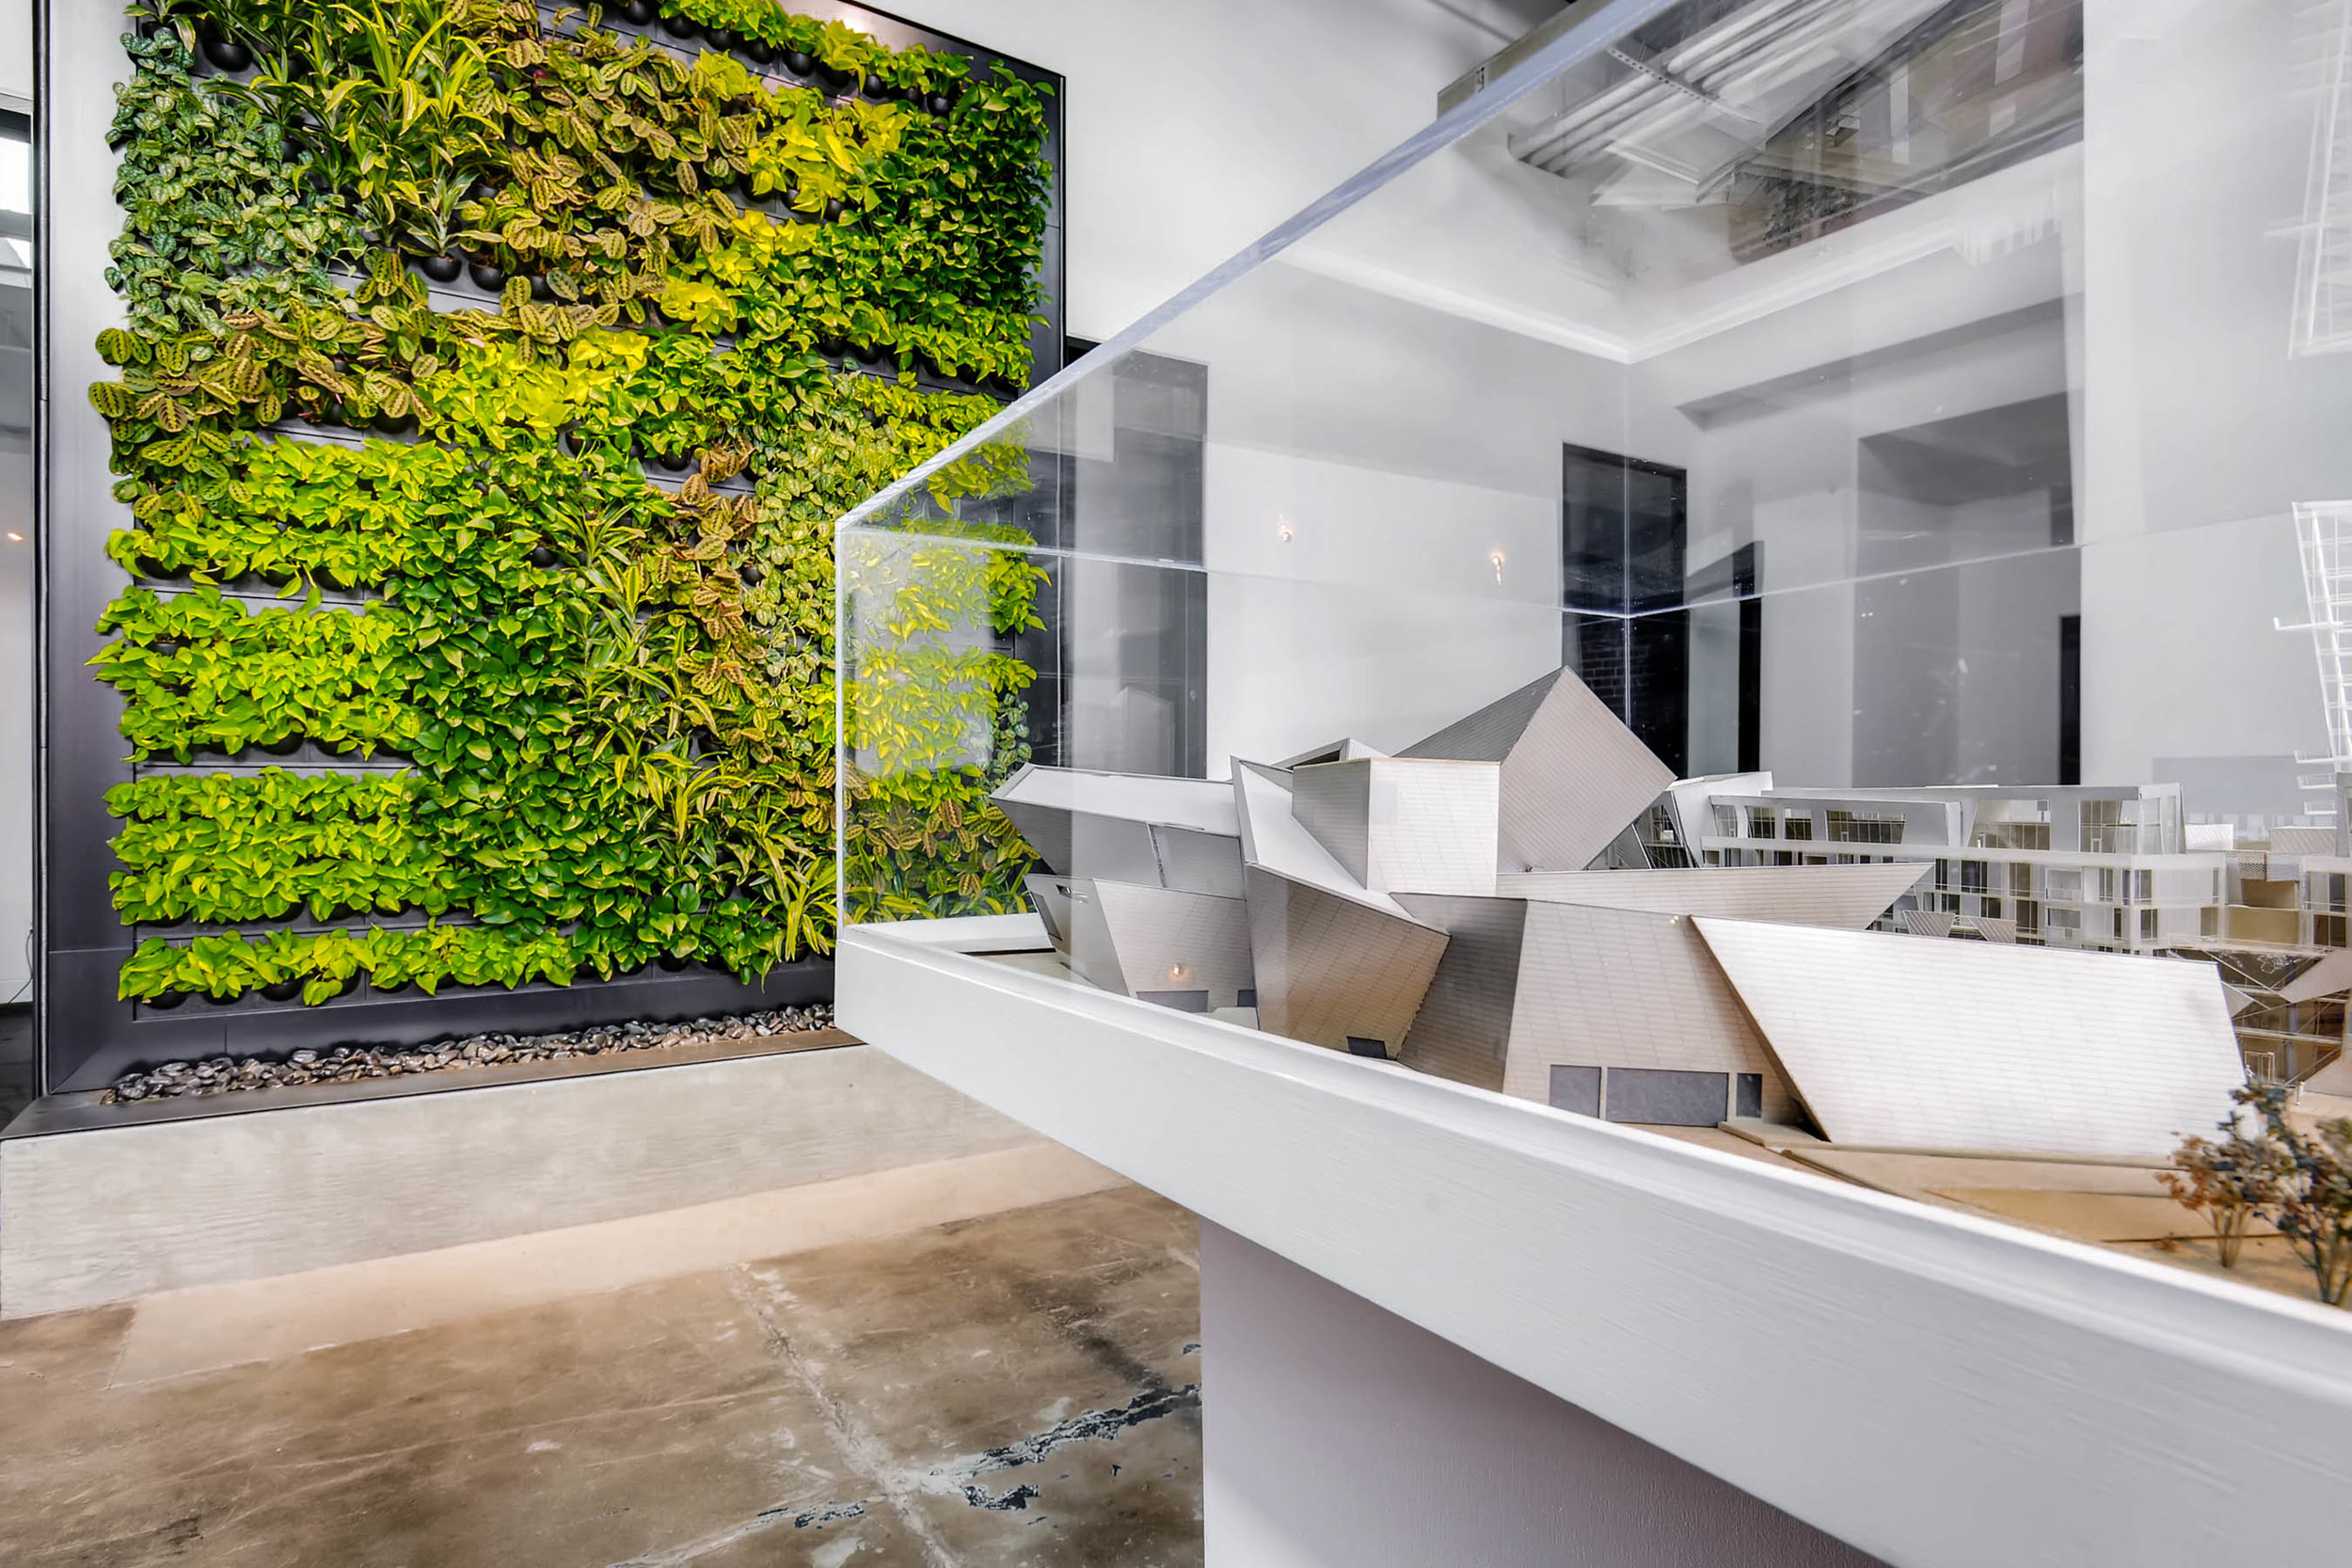 Plants in Modern Architecture - Denver, Colorado